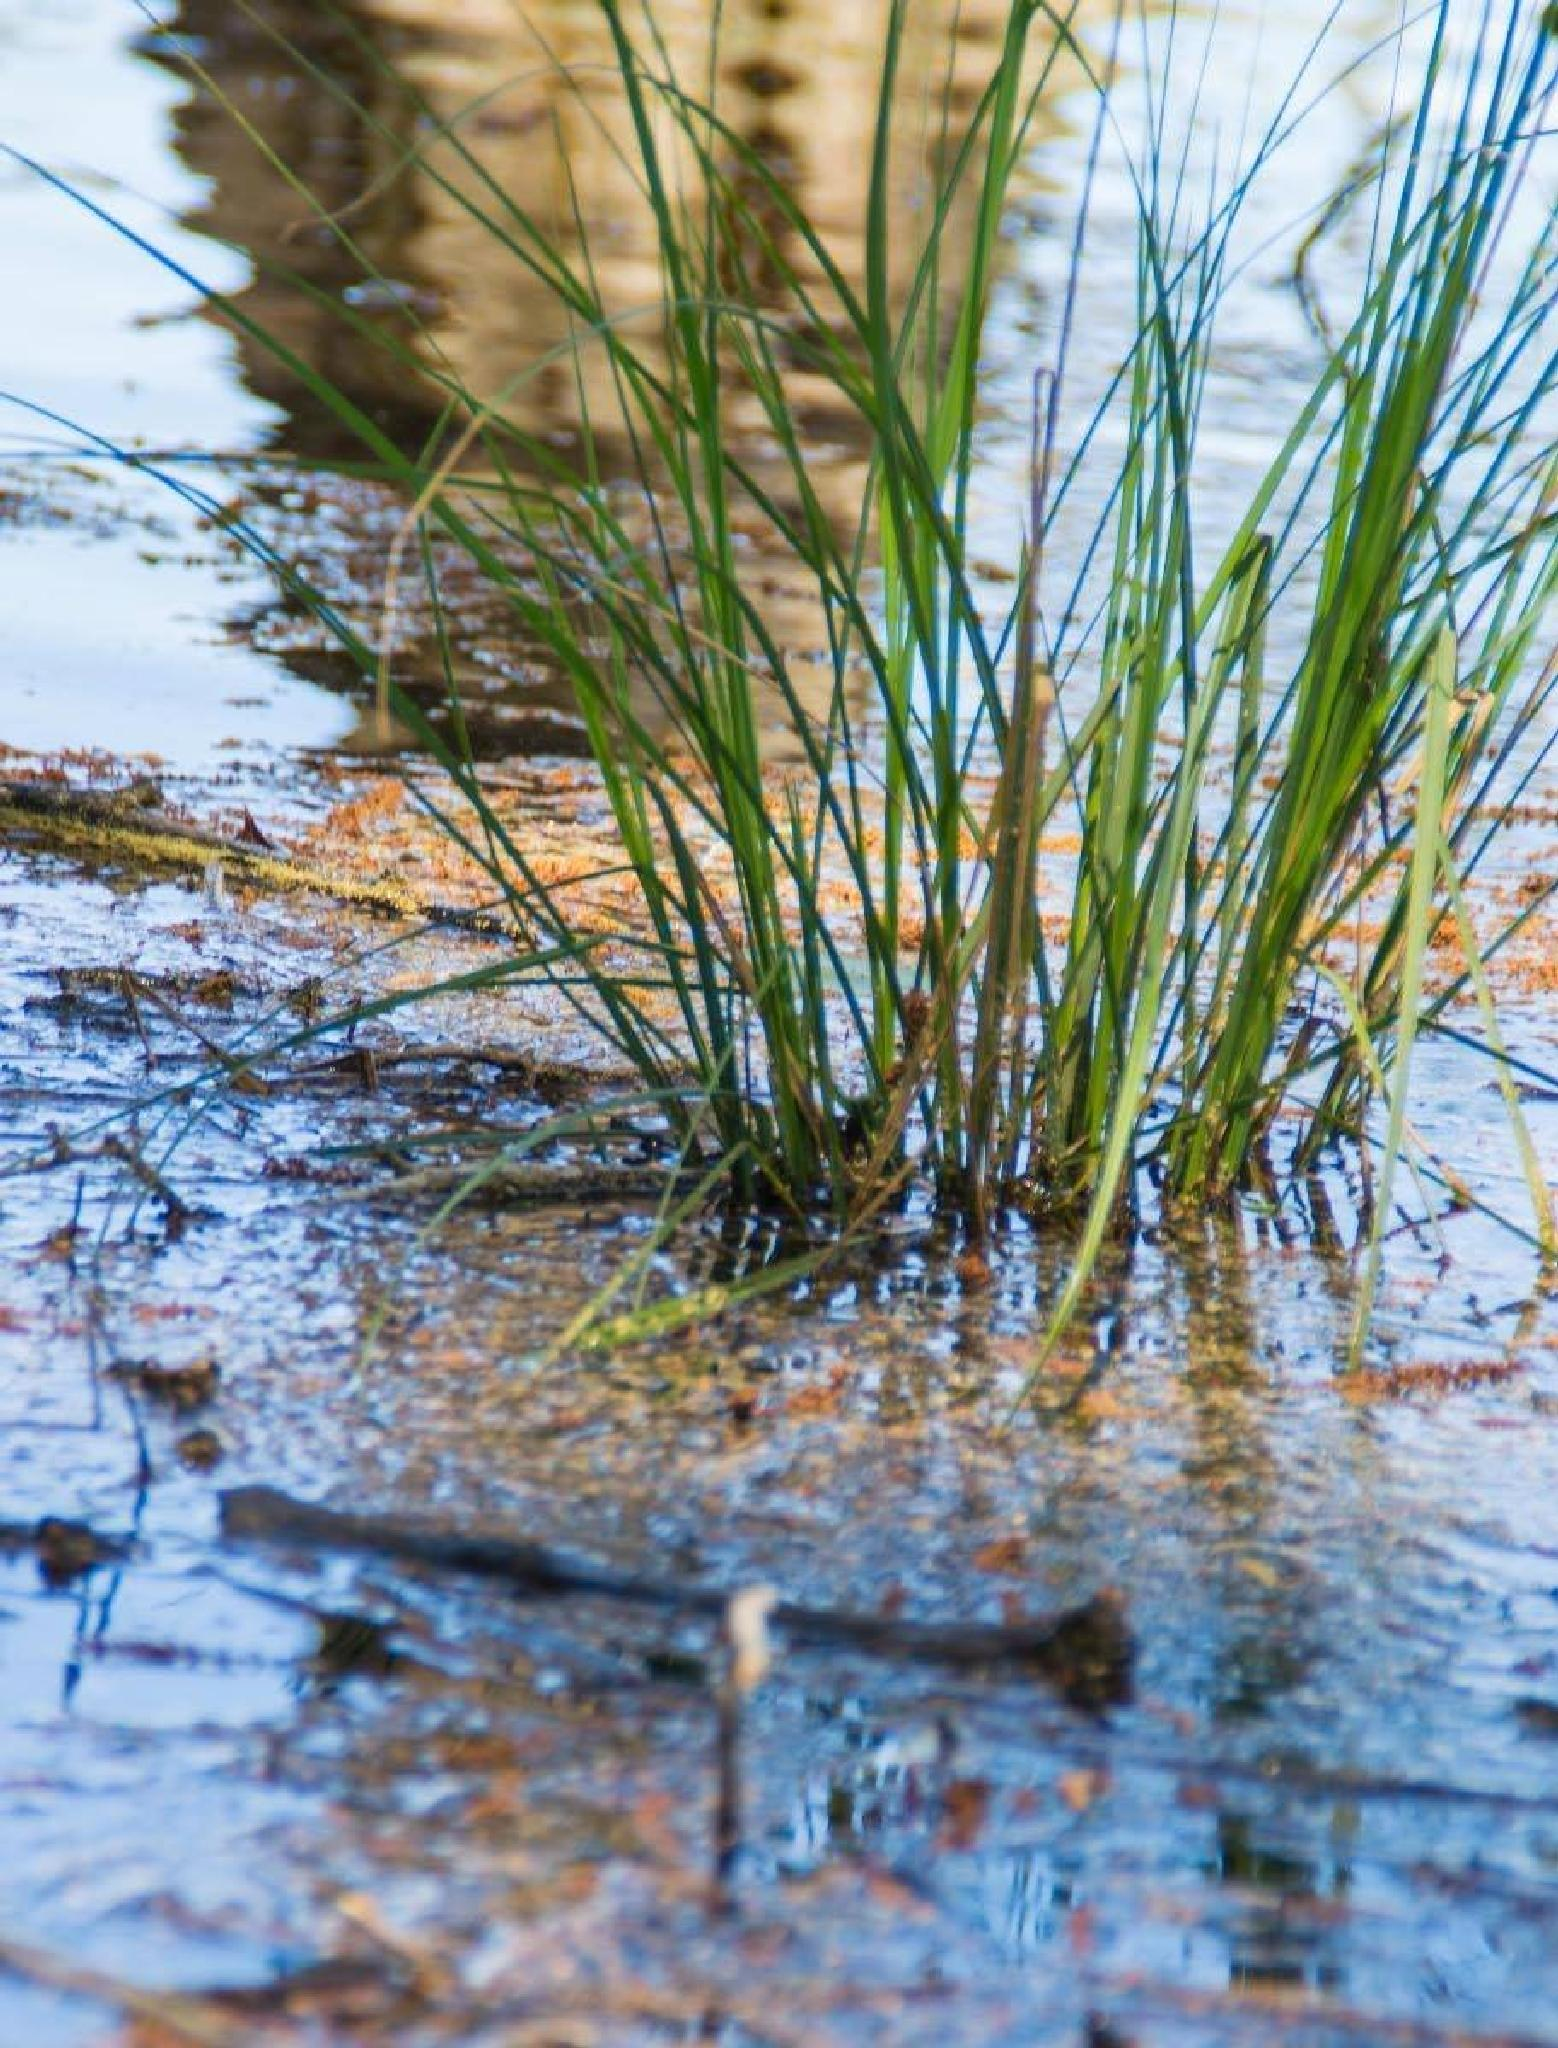 Swamp grass by nora.j.jones